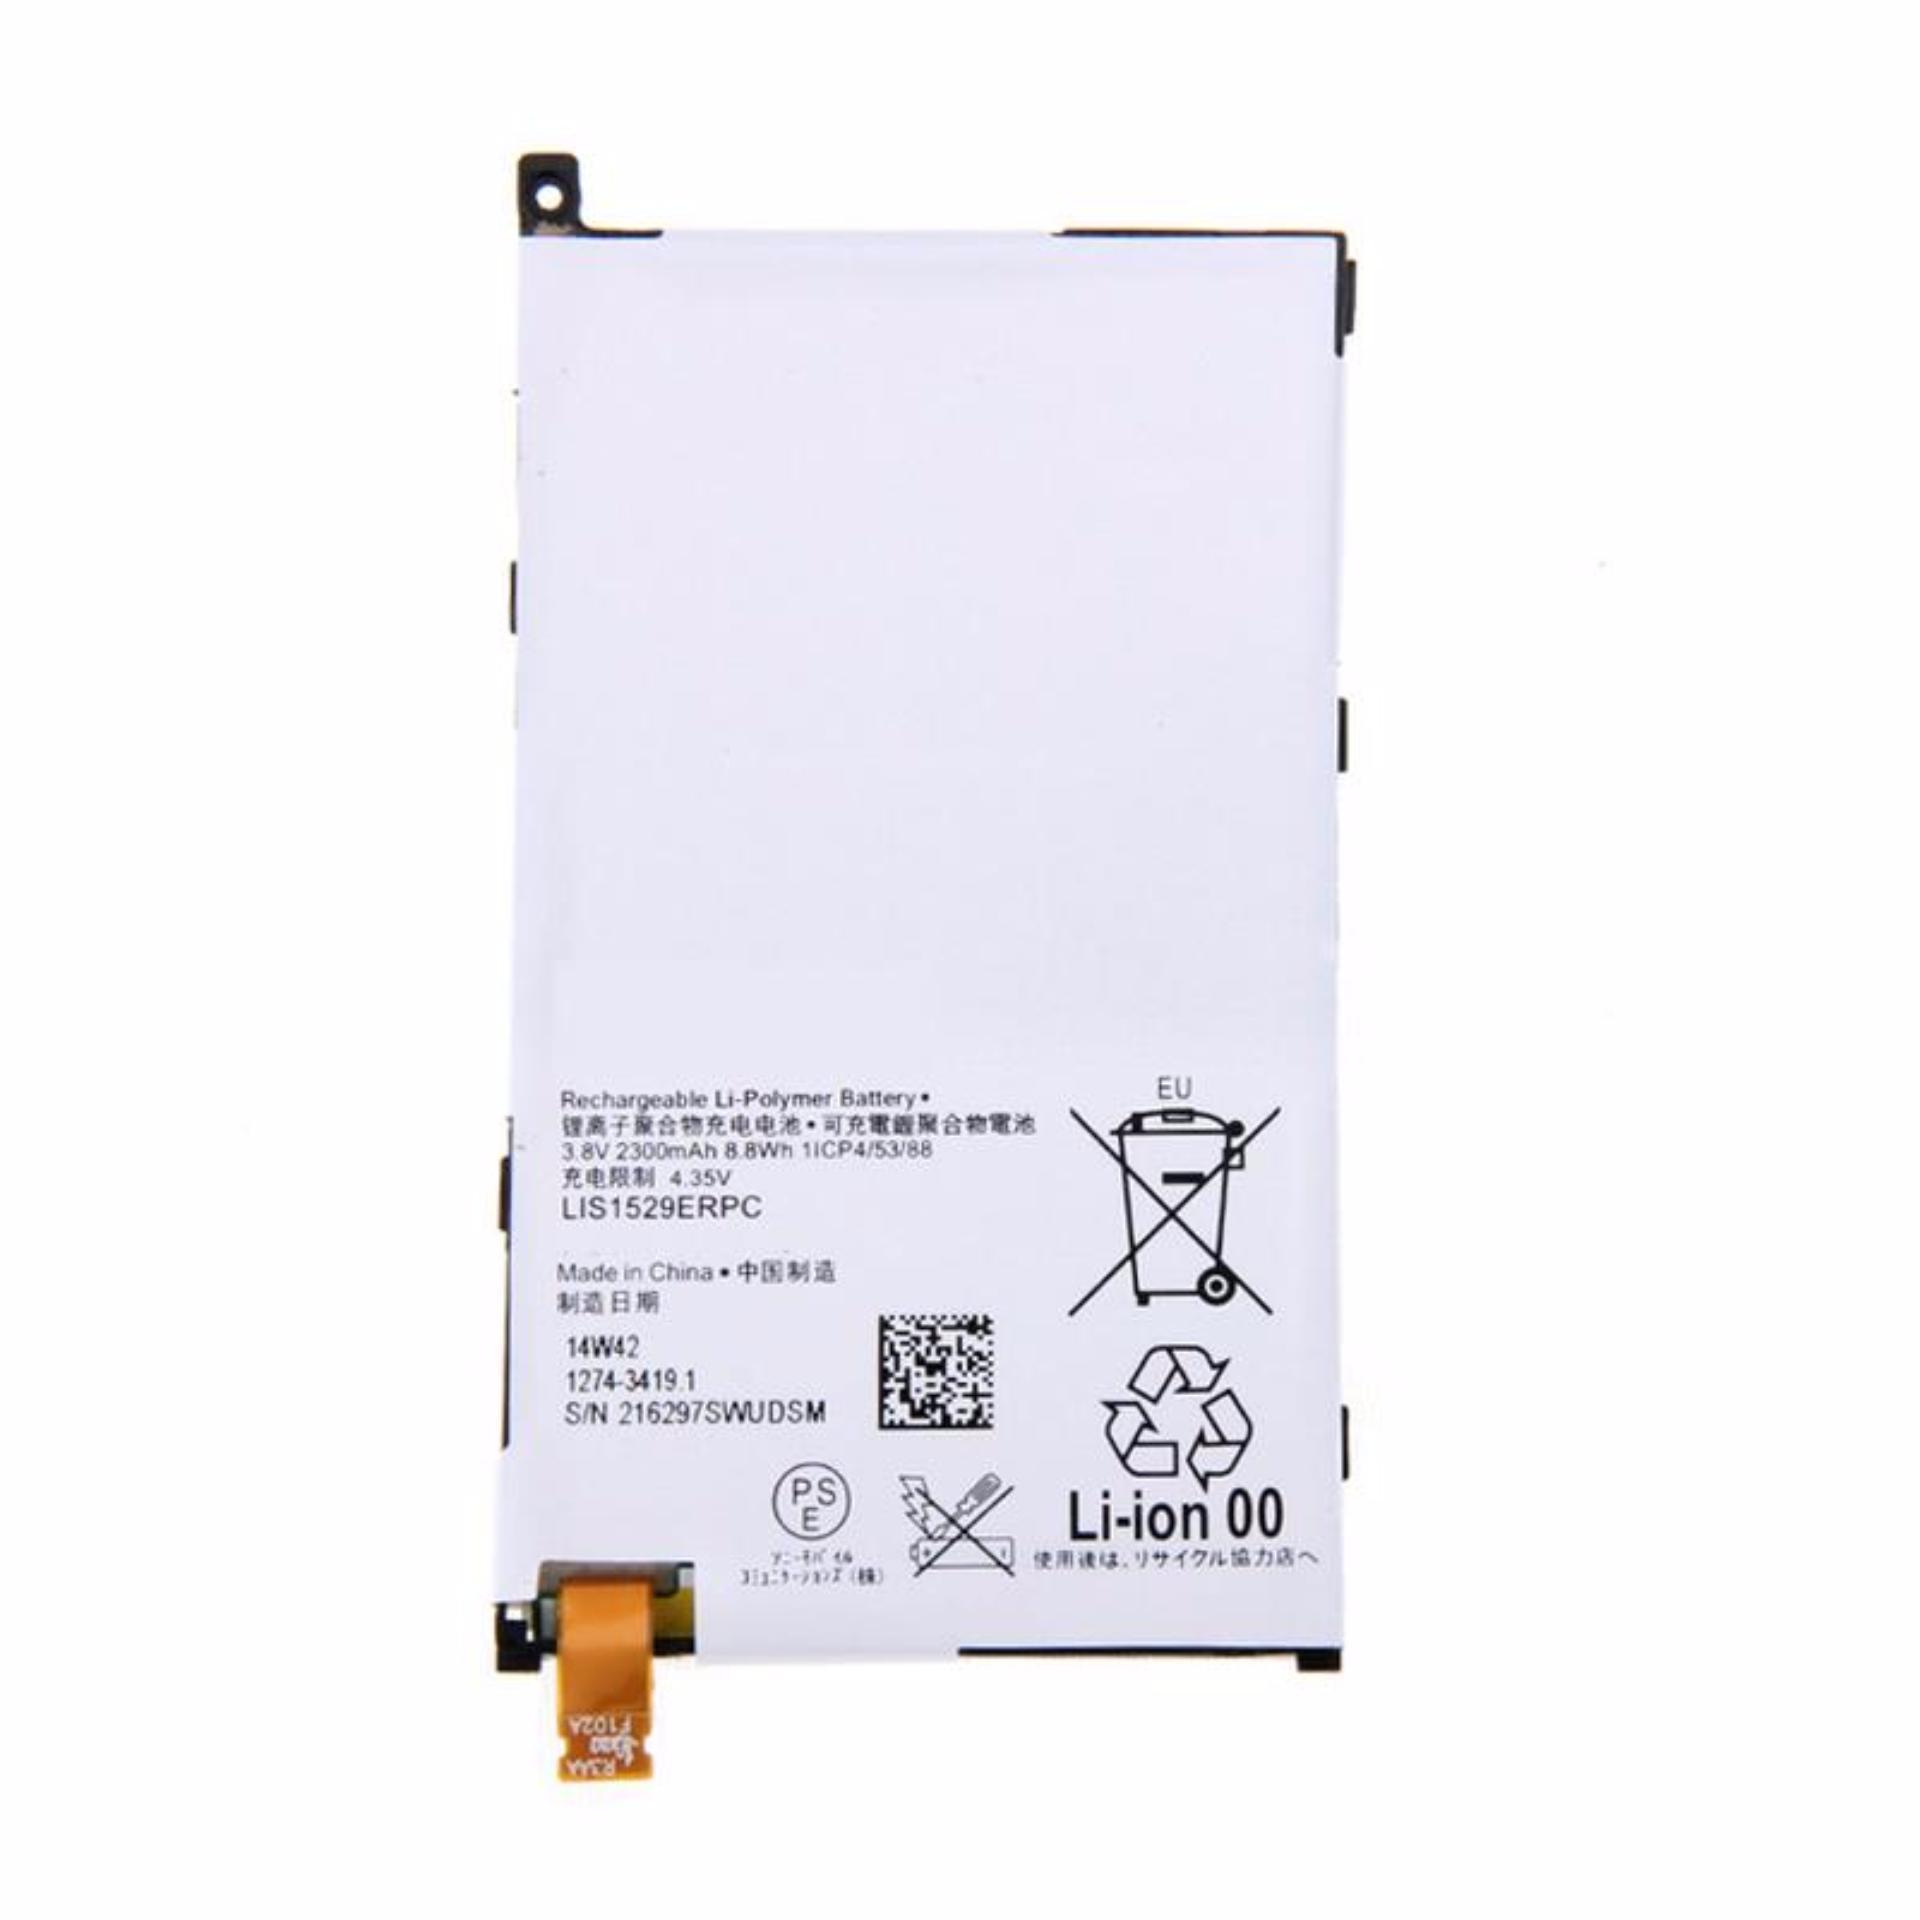 Pin Sony Xperia Z1 Compact/ Z1 Mini/ M51W/ D5503